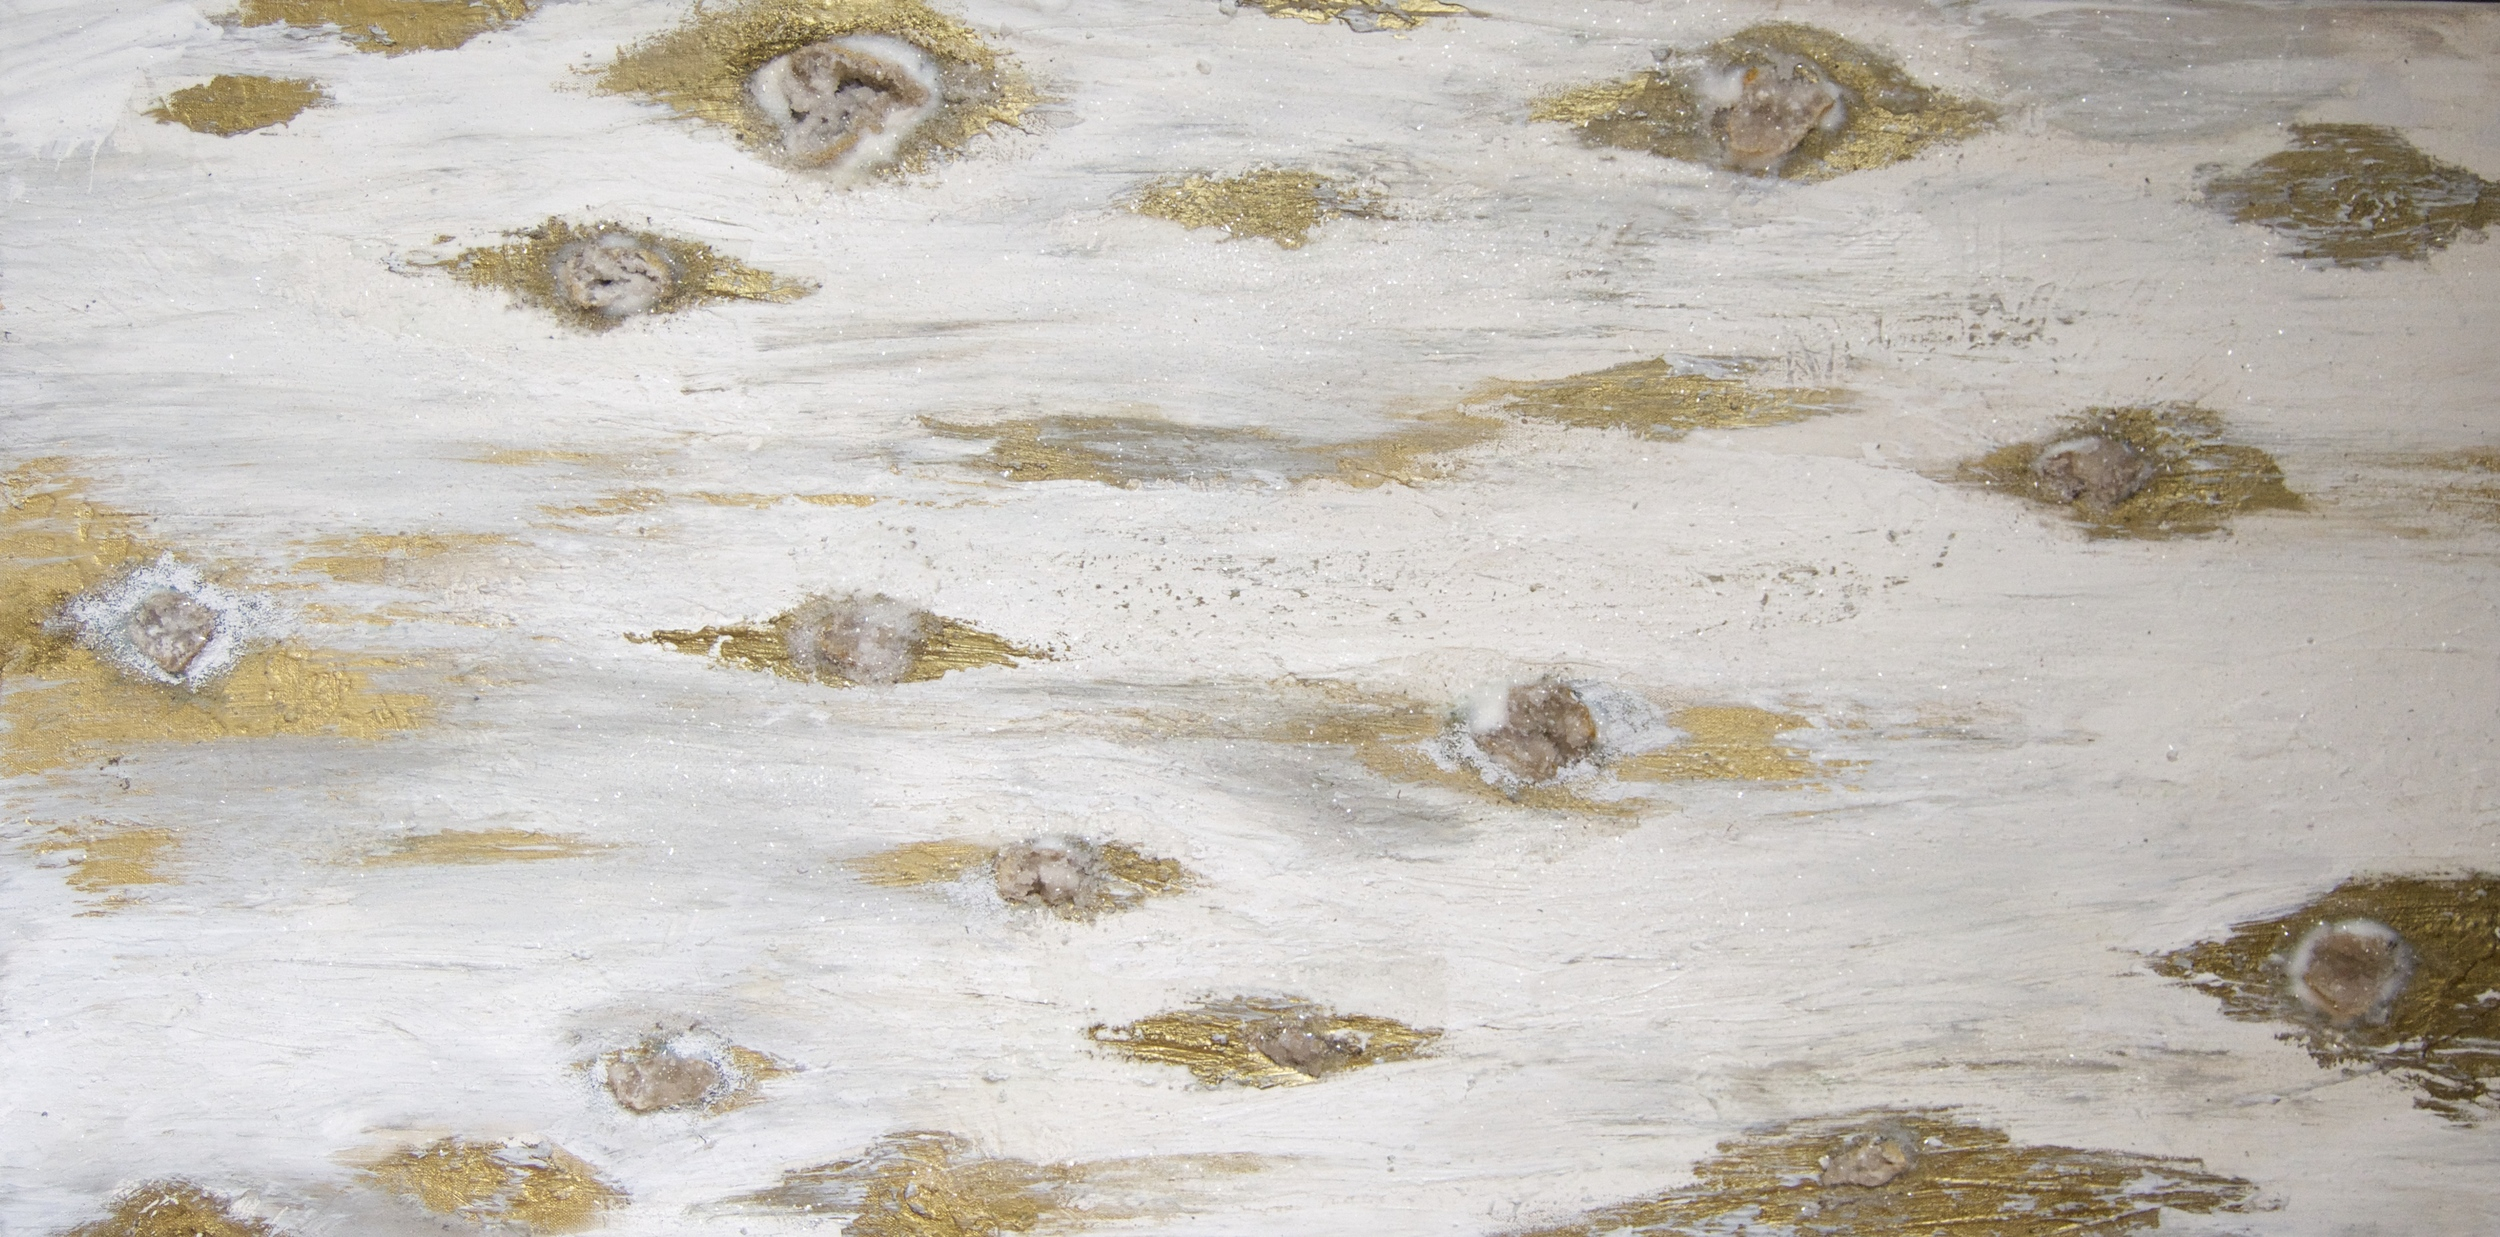 Crystals on the Clouds - Sarah Raskey Fine Art